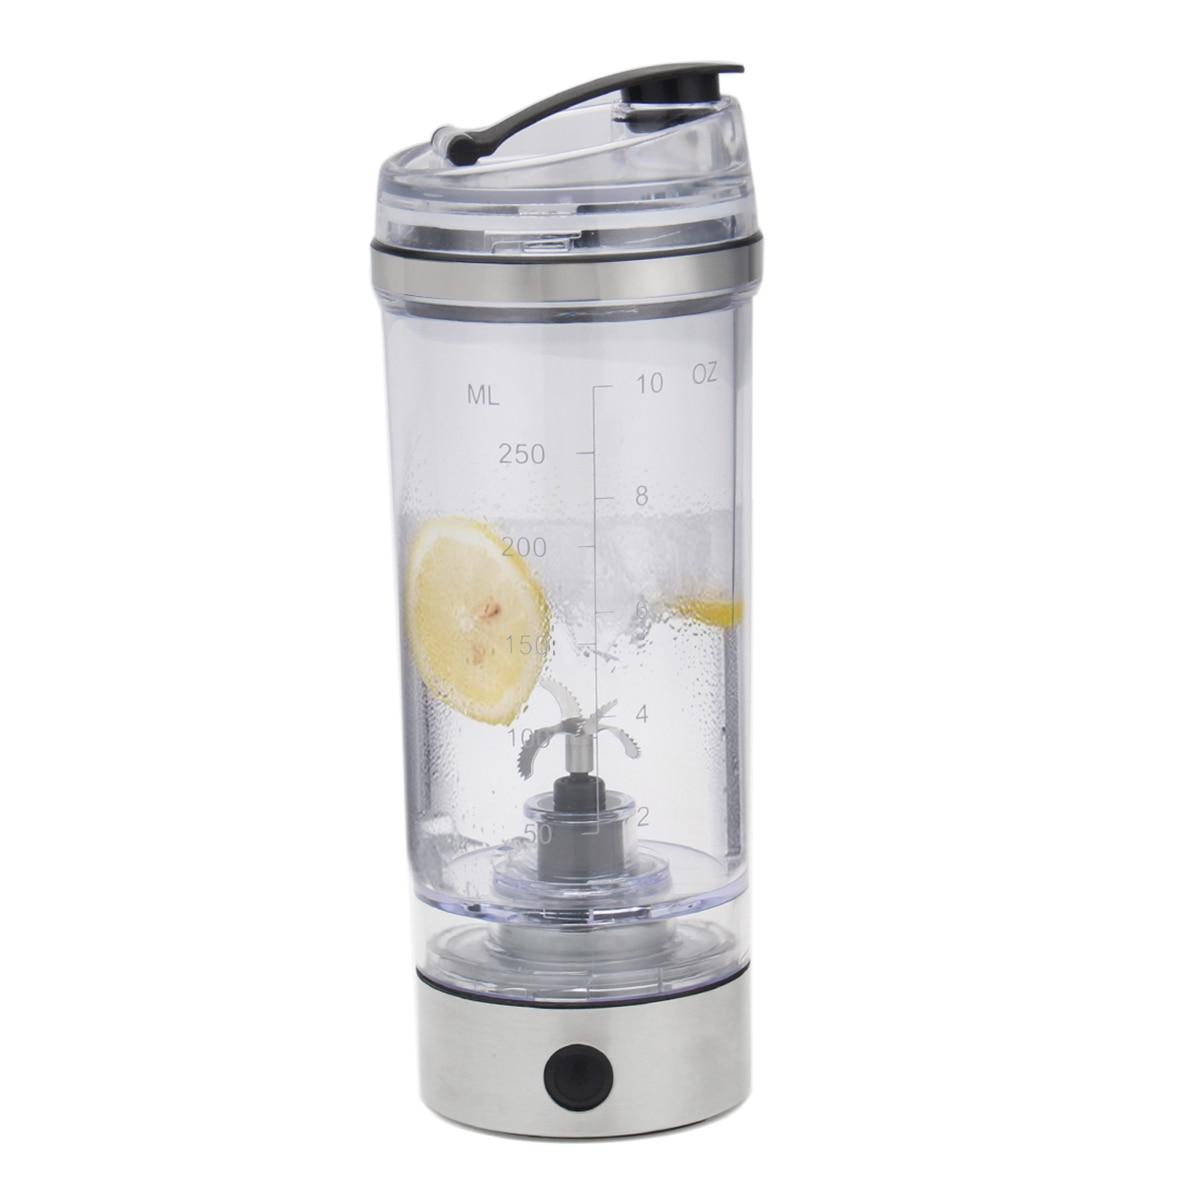 Hf32e3f59e3d44f3f9832415064e39782u 2019 250ML Electric Protein Shake Stirrer USB Shake Bottle Milk Coffee Blender Kettle Fitness Vortex Tornado Smart Mixer